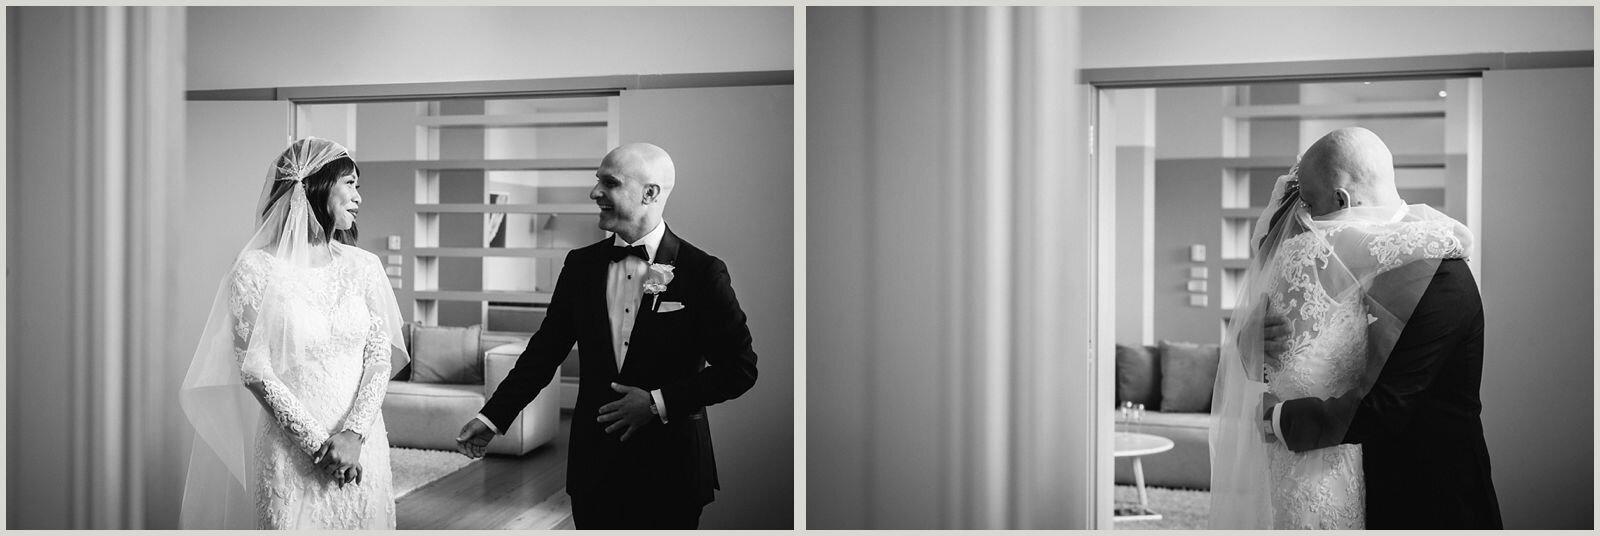 joseph_koprek_wedding_melbourne_the_prince_deck_0020.jpg